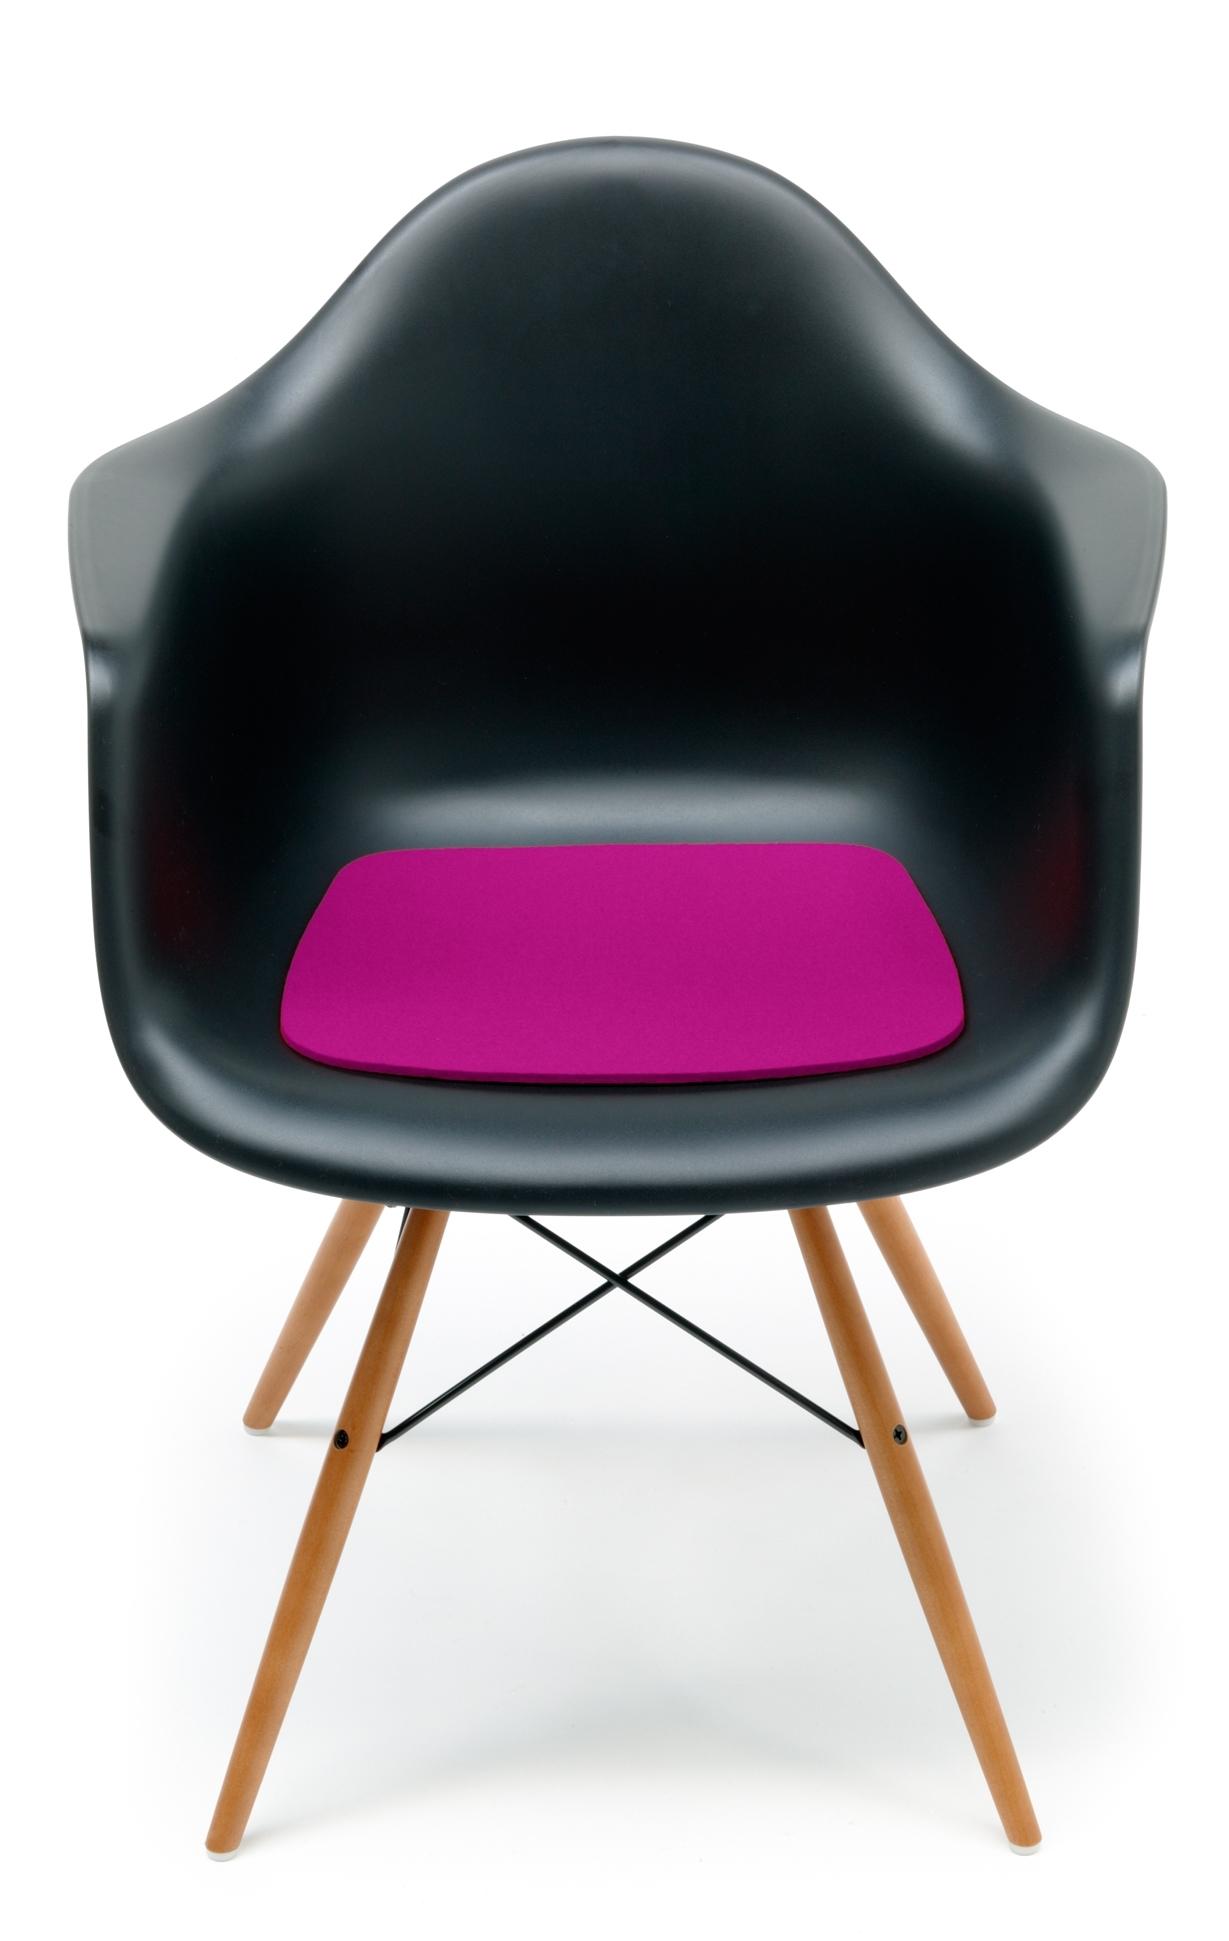 Sitzauflage-Filzauflage Eames Plastic Arm Chairs DAR / RAR / DAW  Pink Hey Sign